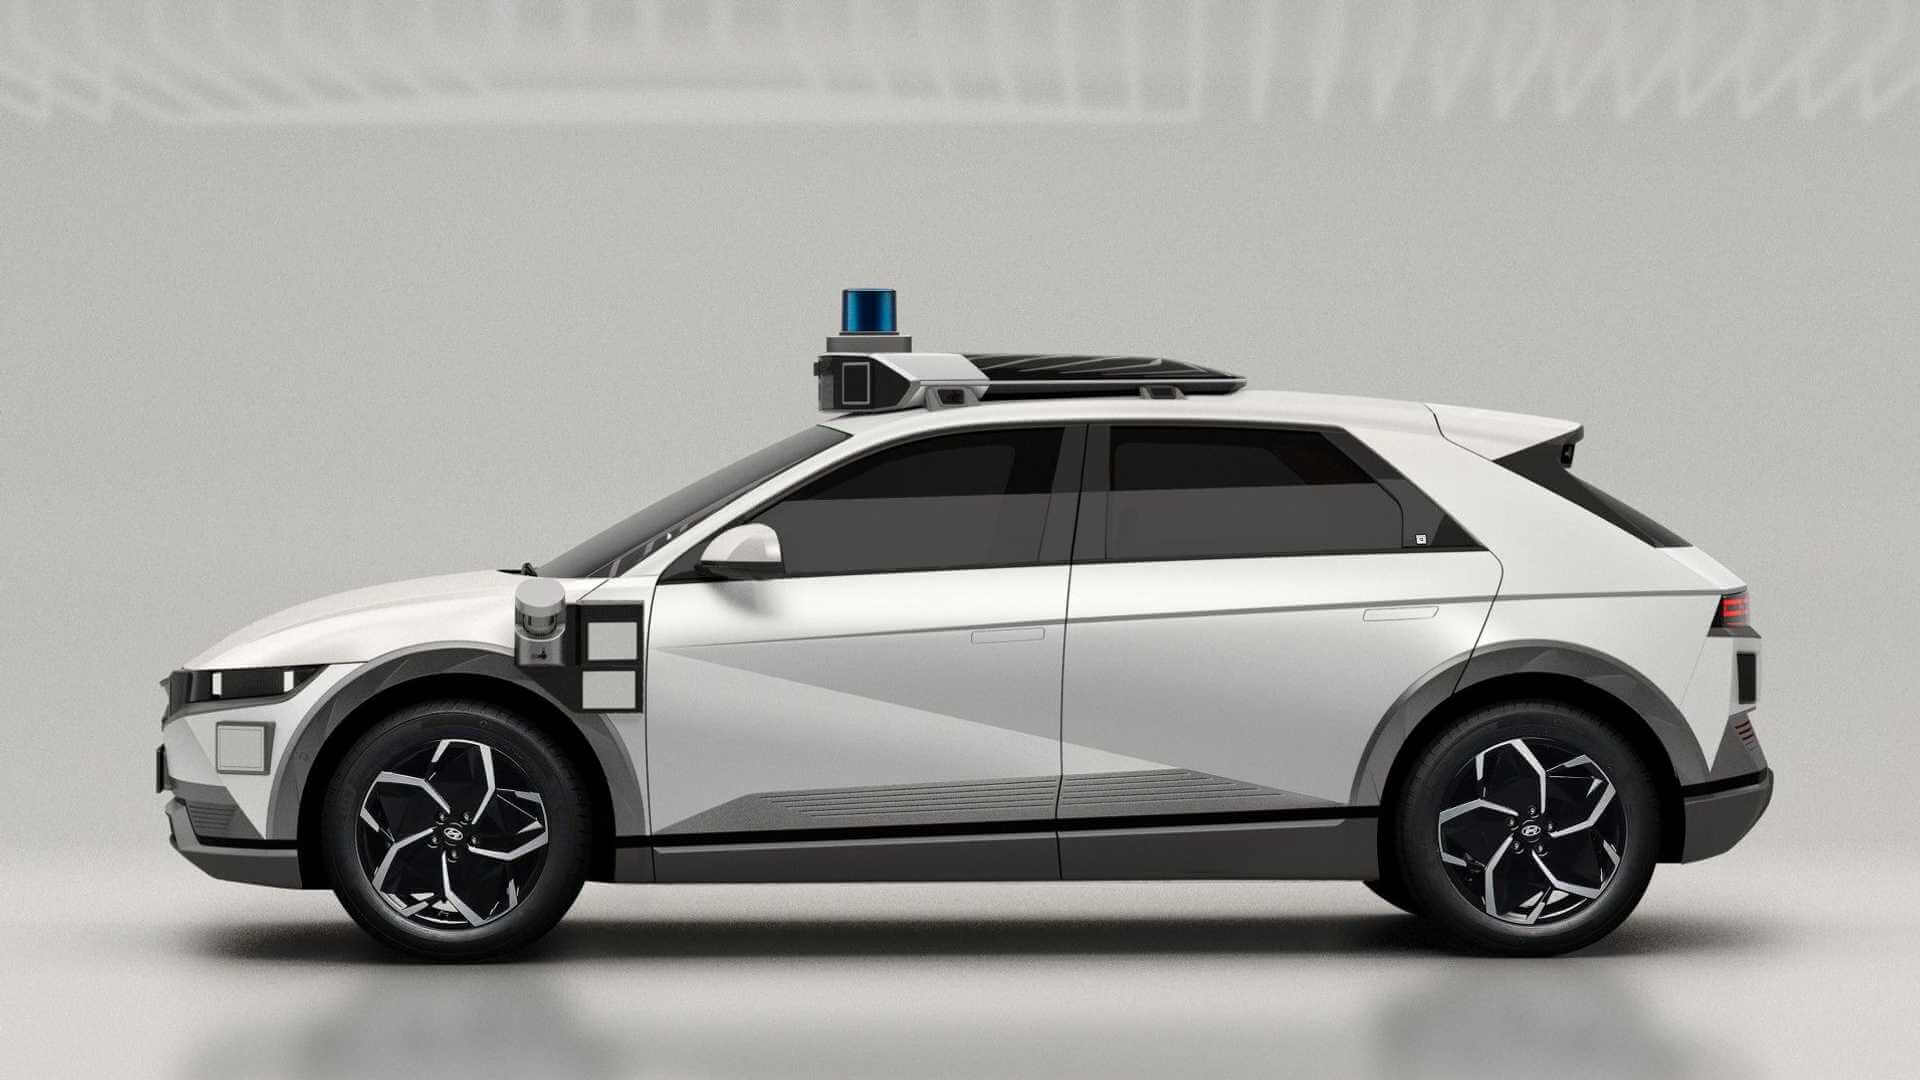 Hyundai IONIQ 5 превращается в роботакси для Motional